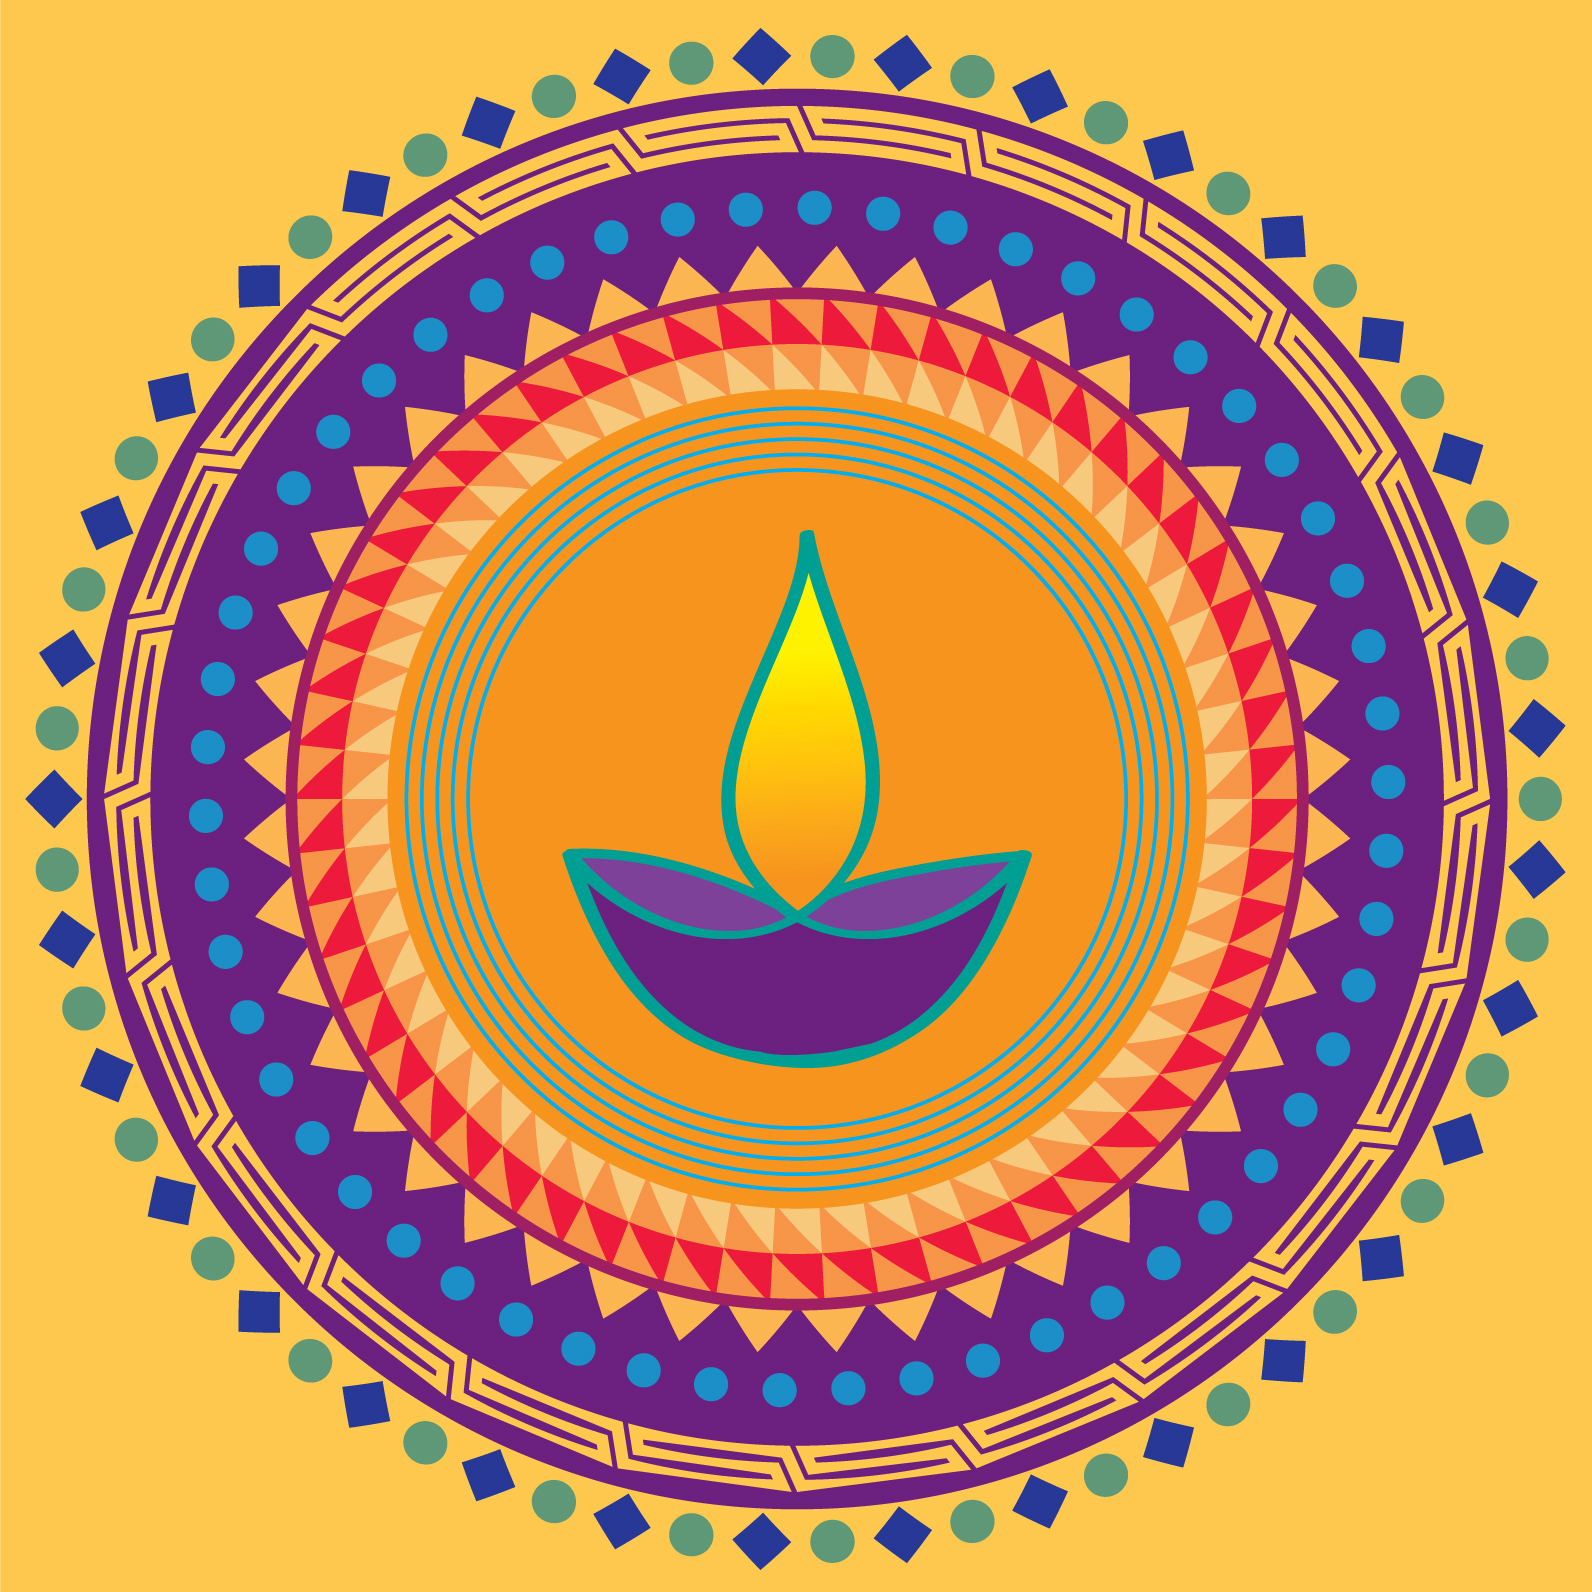 Diwali greeting card by Ananya